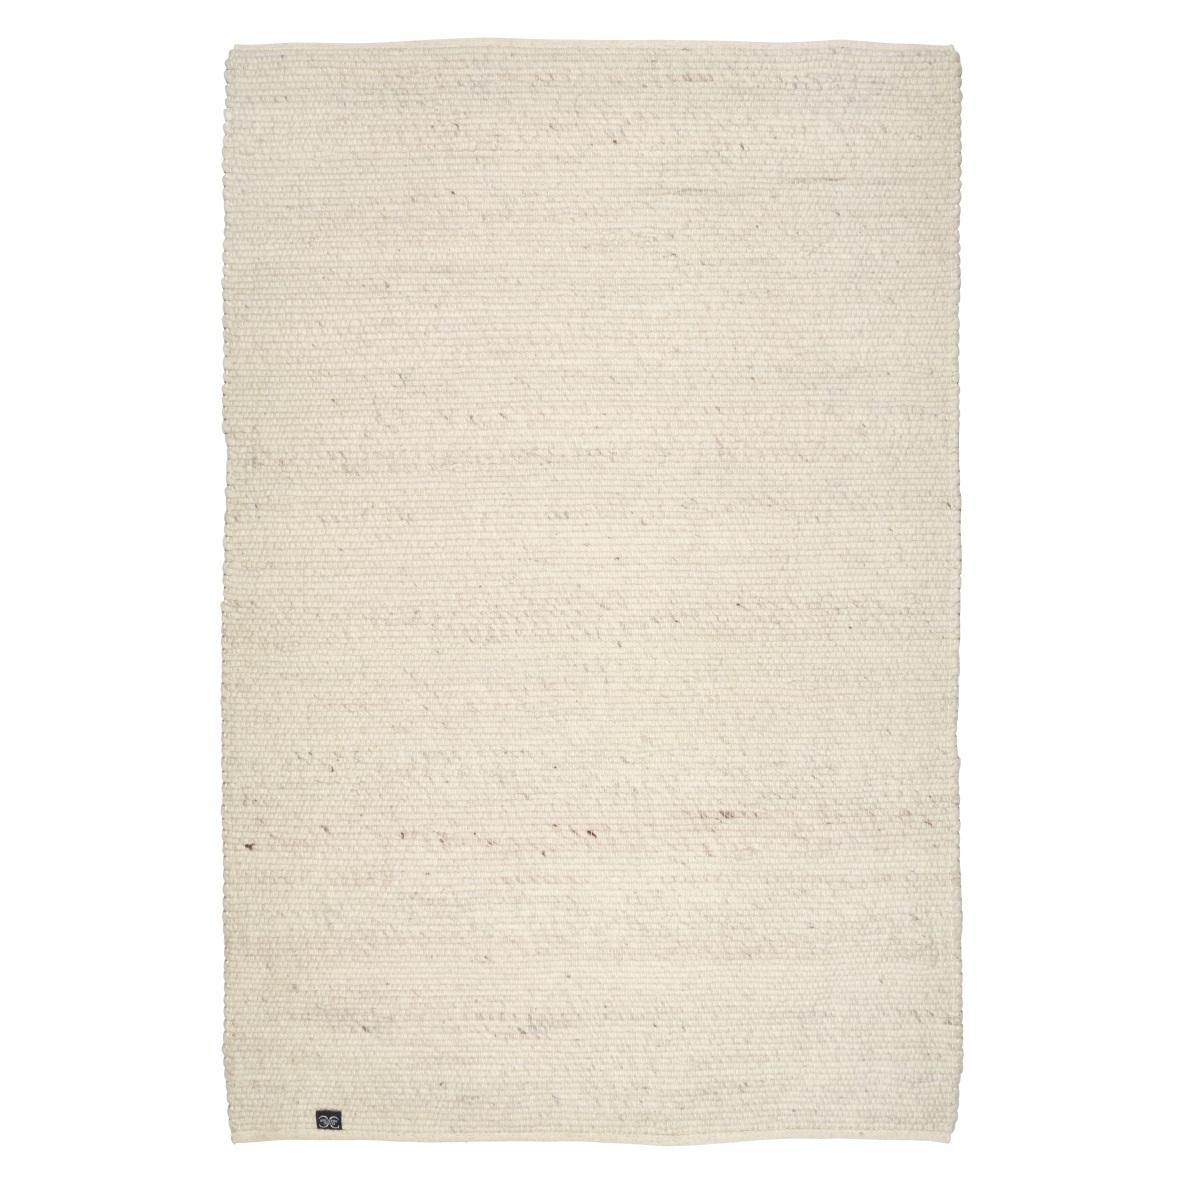 Ullmatta Merino vit 170 x 230 cm Classic Collection